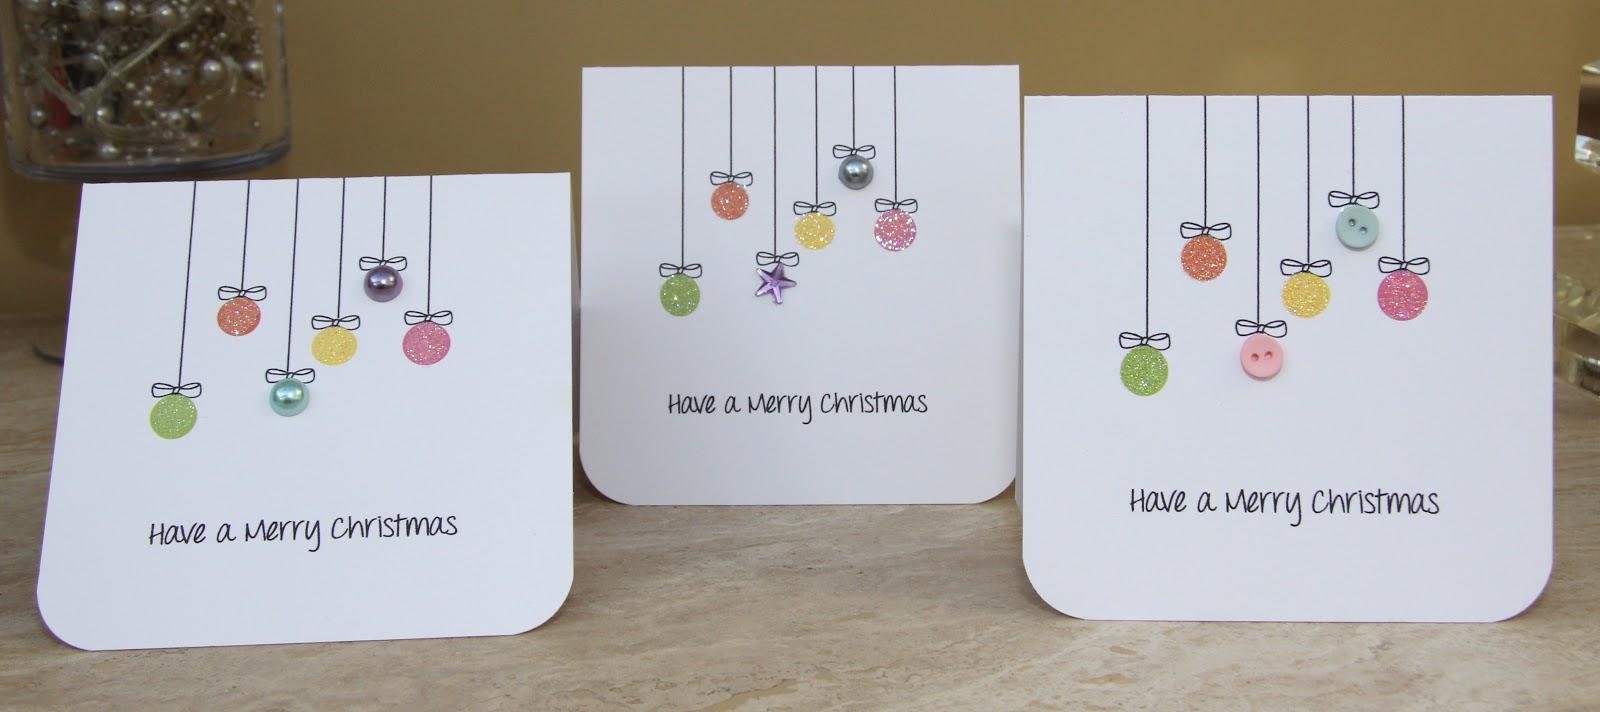 Handmade with Love: School Christmas Cards